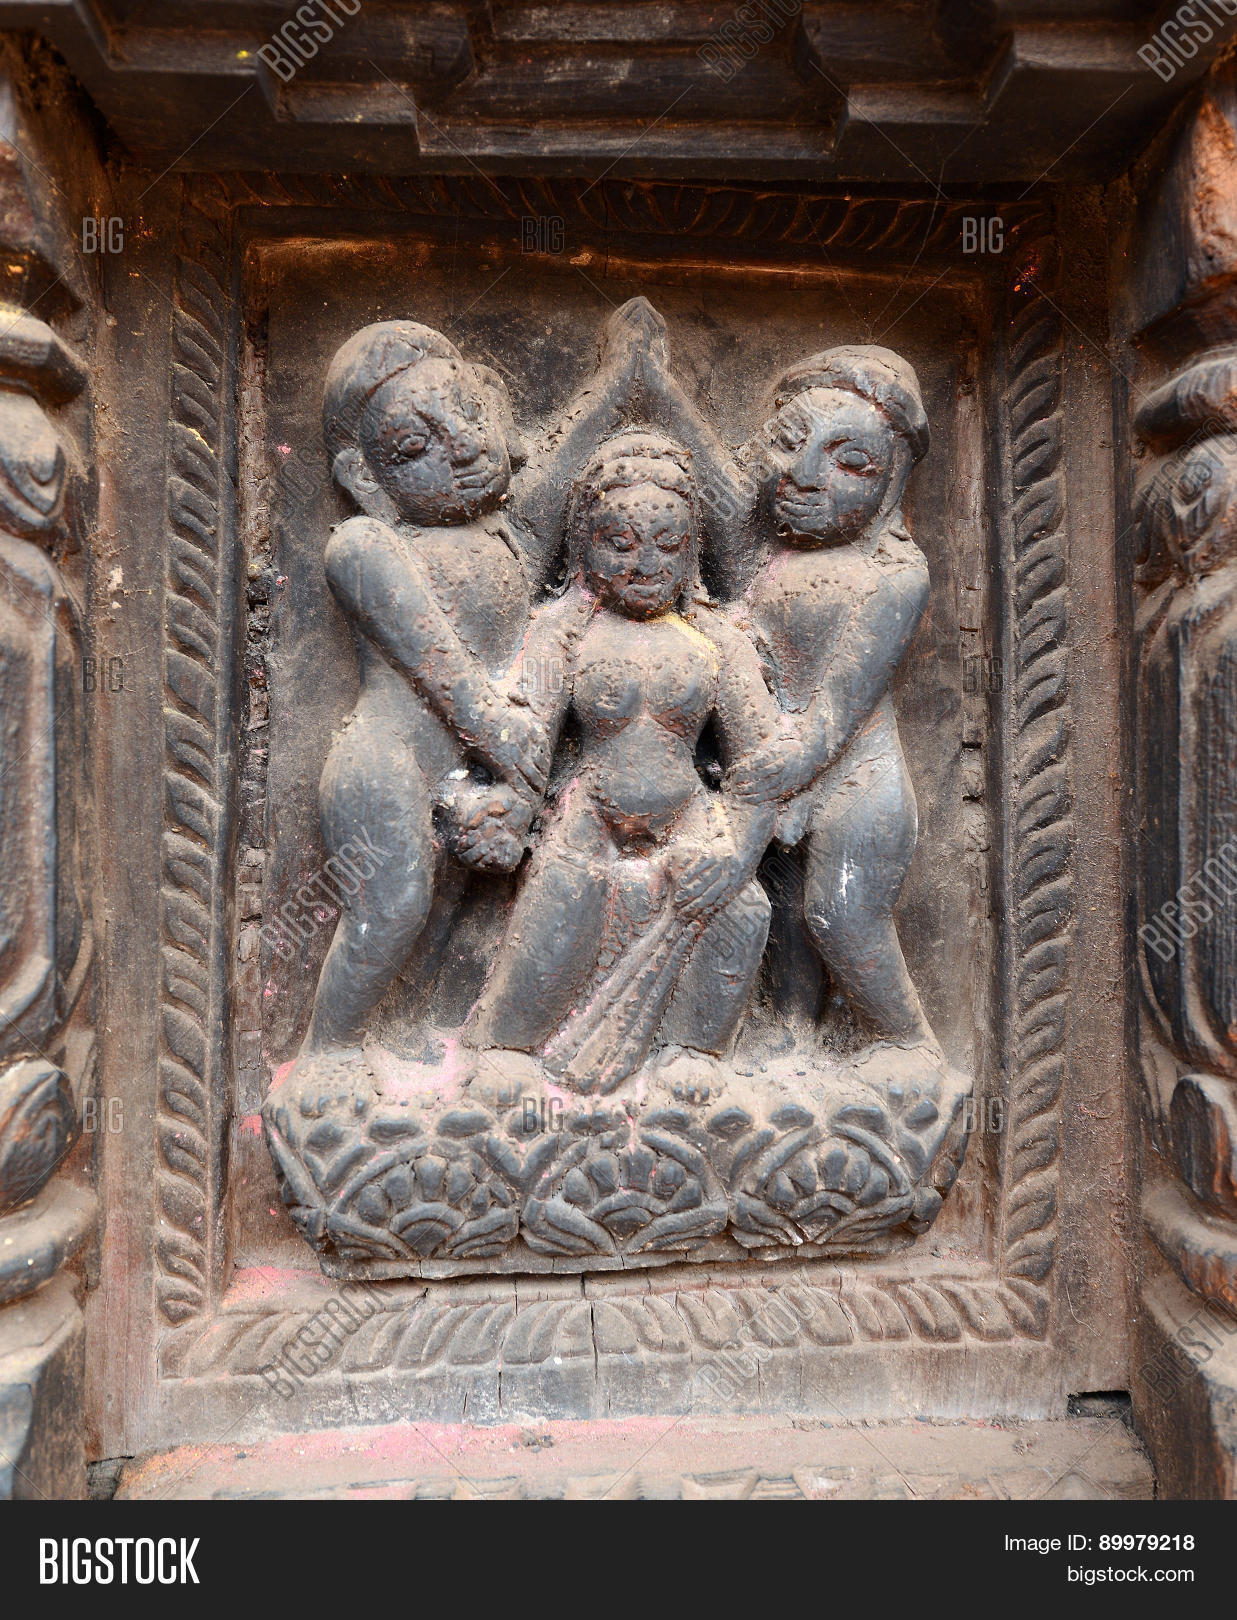 Video, Erotic carving on temples fravorite fravorites